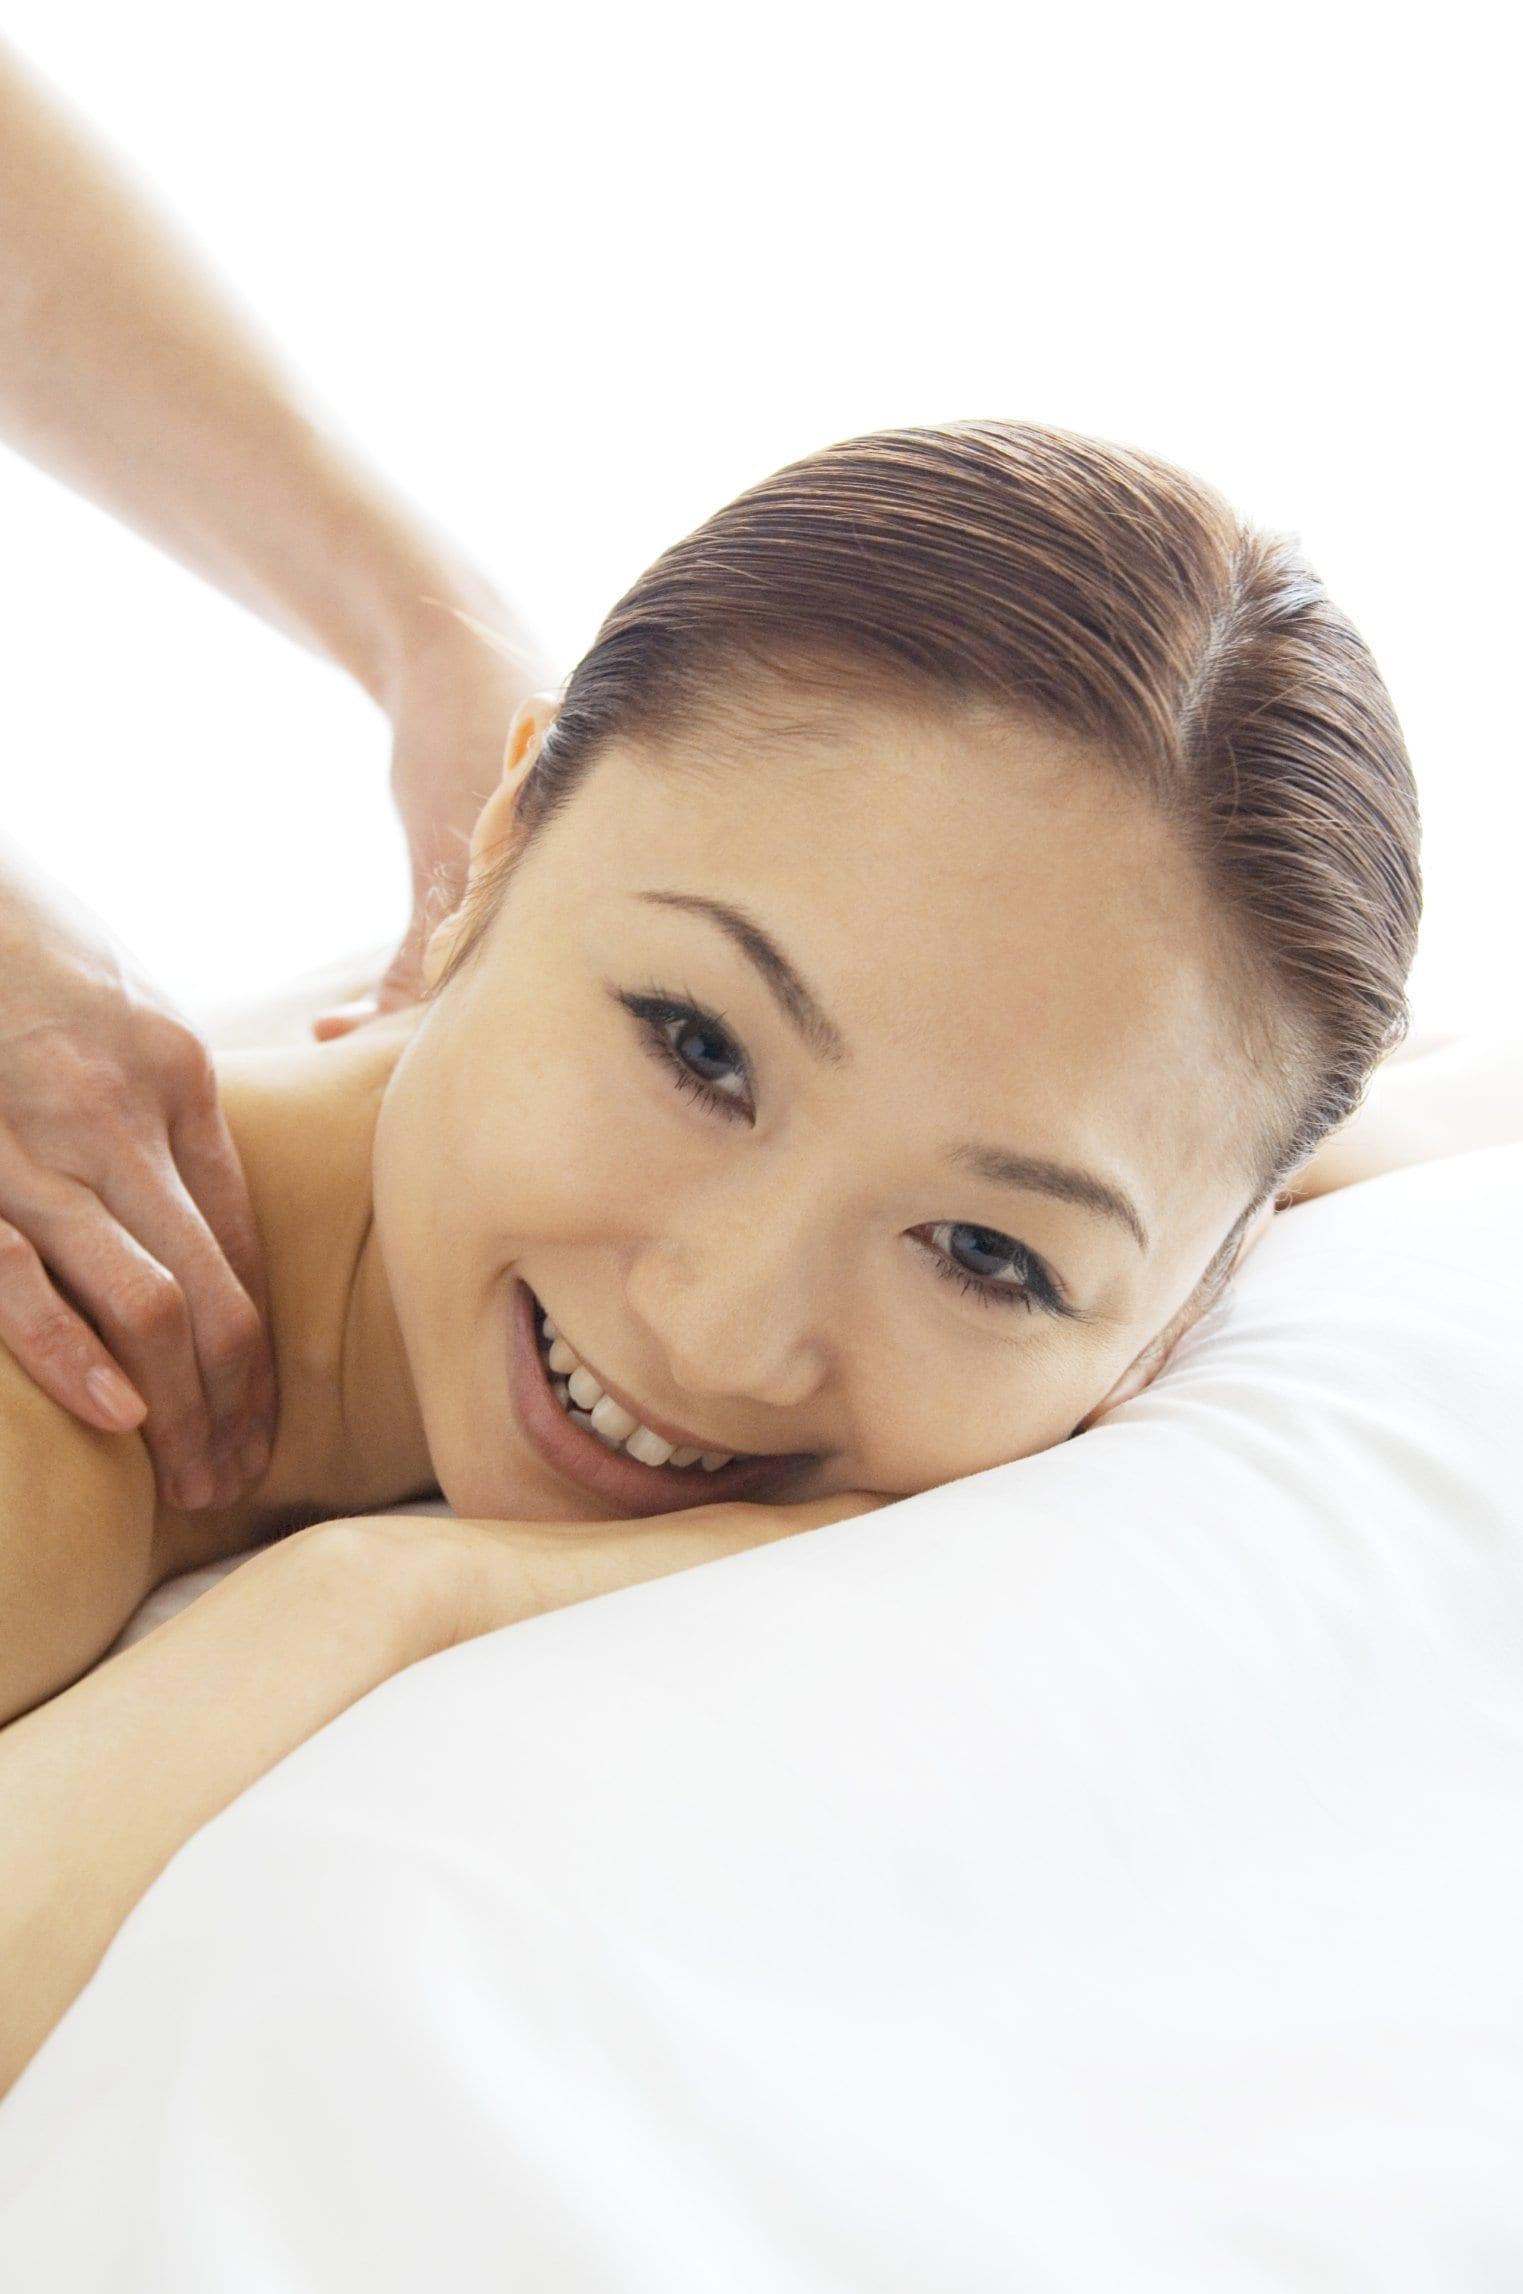 Northbridge Full Body Massage - Massage Therapy - Perth